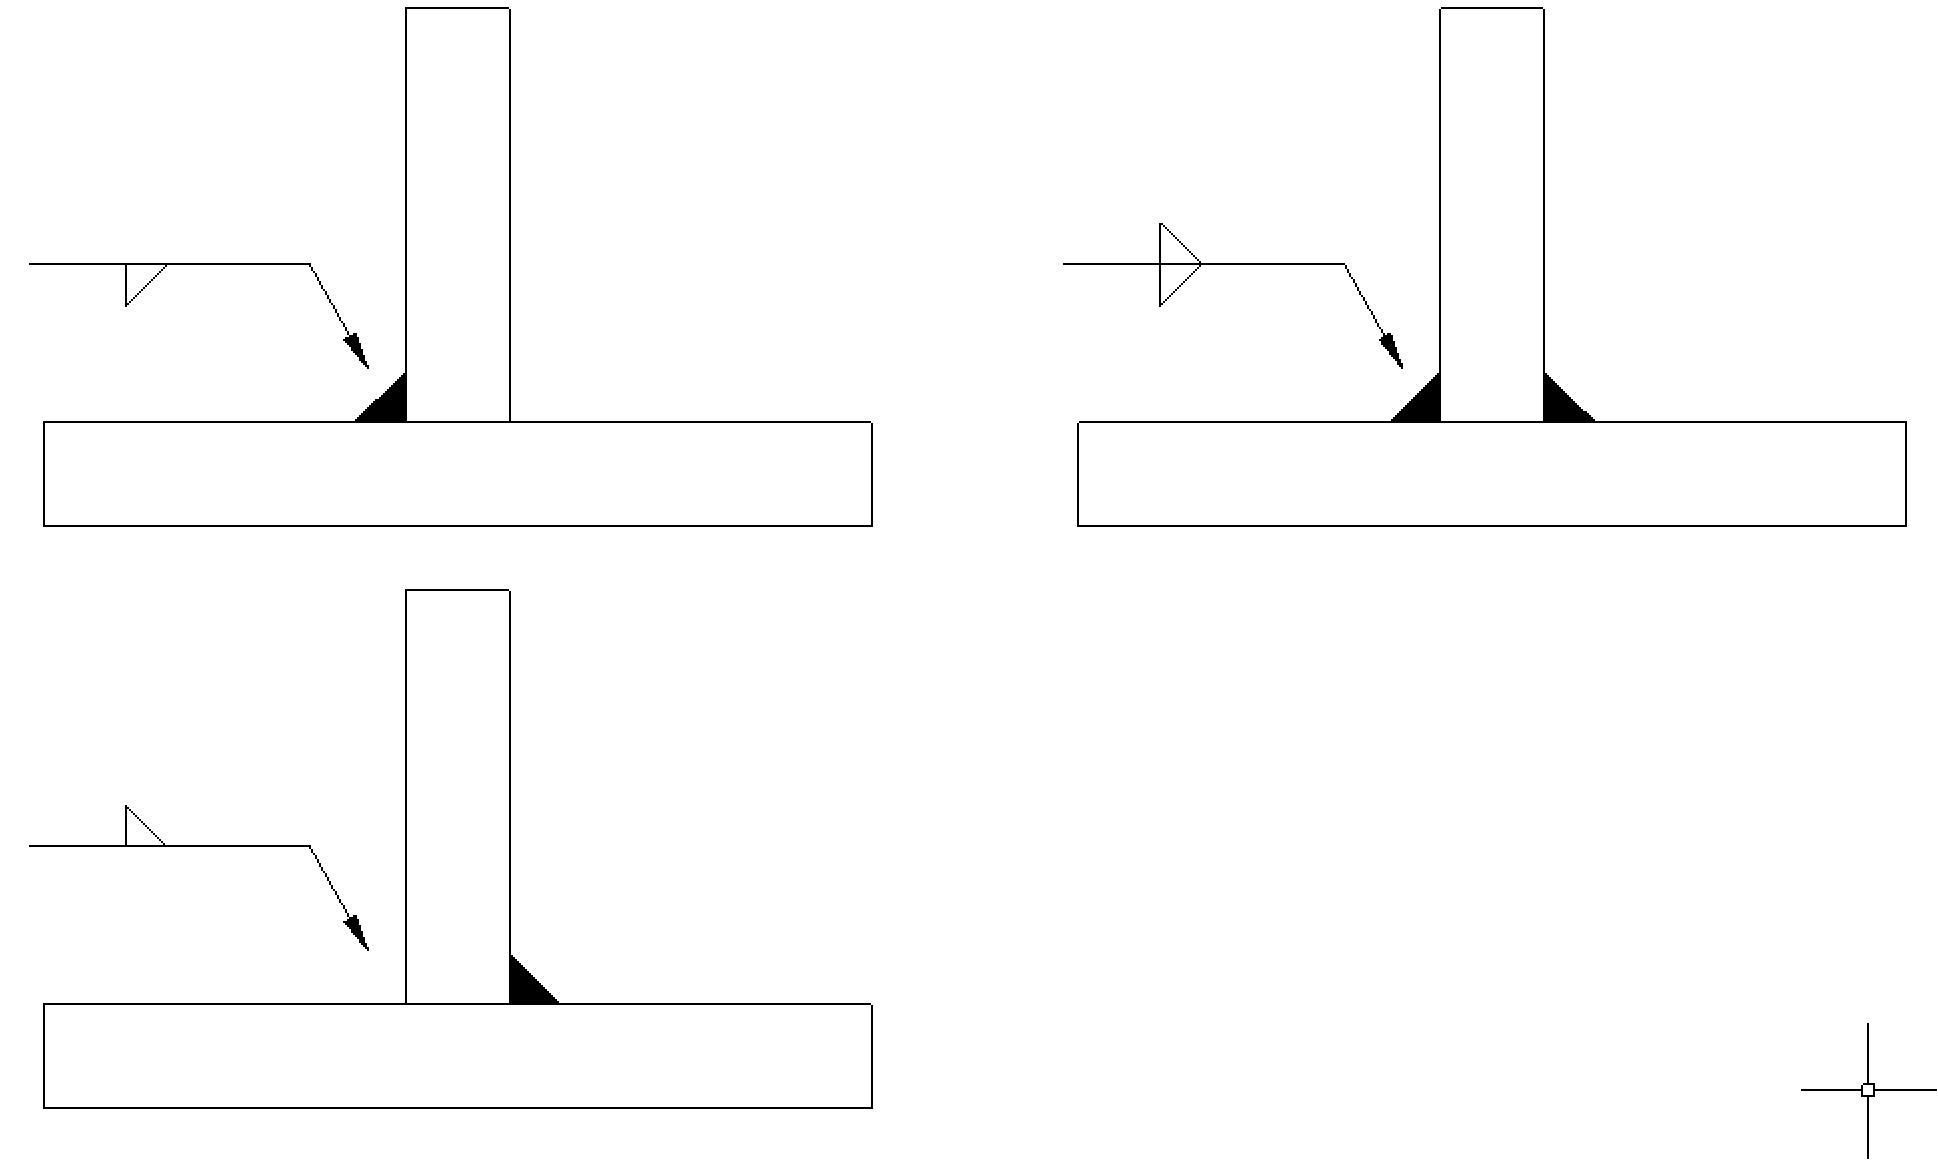 Fillet Weld Symbols – Interpretation of Metal Fab Drawings